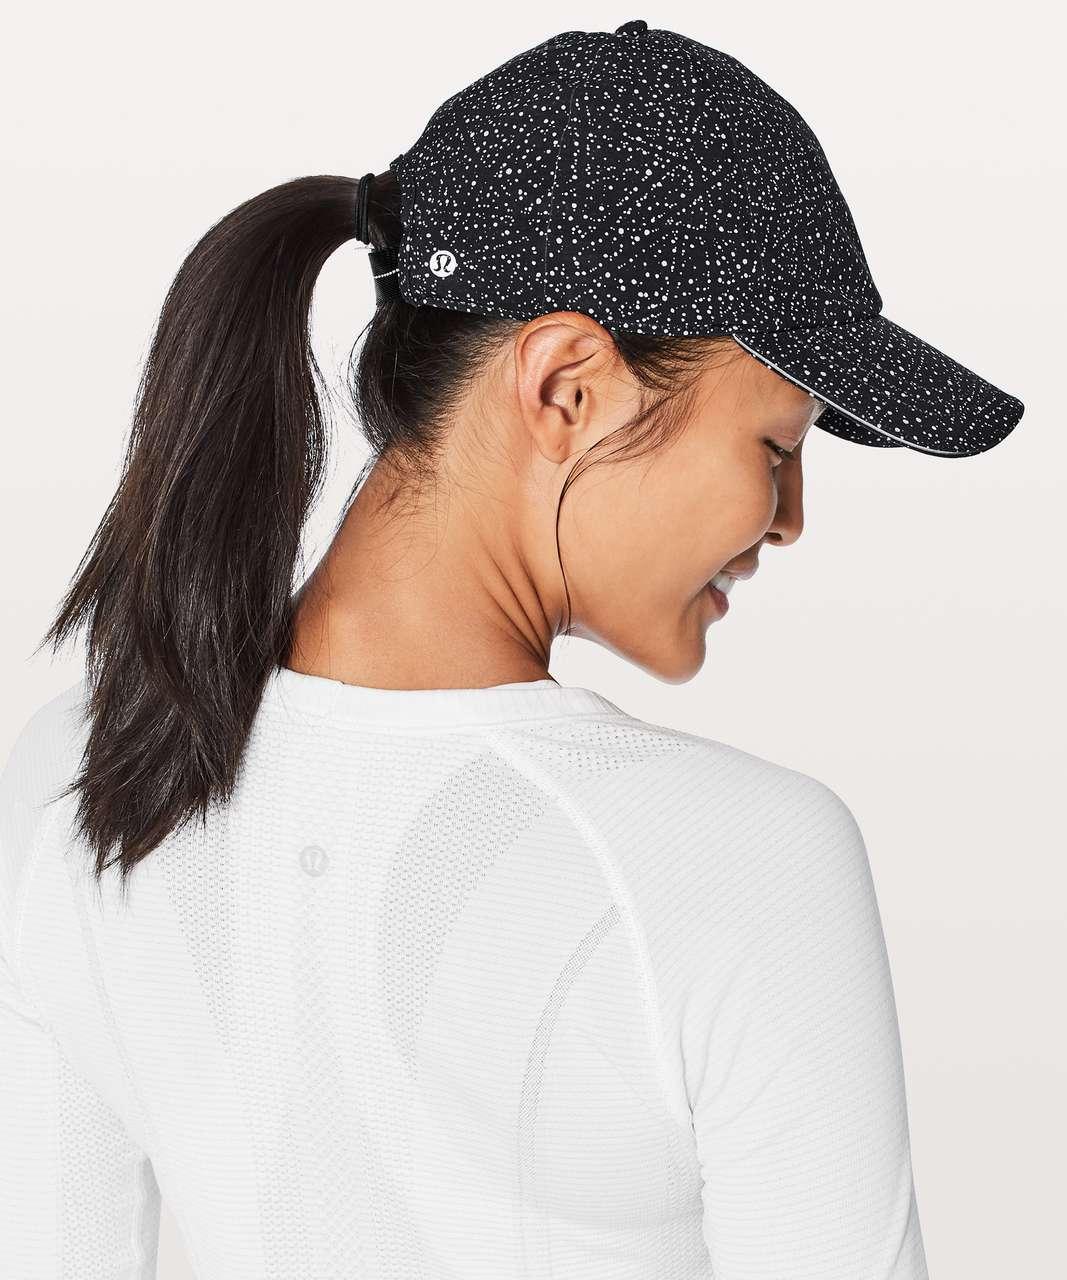 ce5d45fe Lululemon Baller Hat Run - Night View White Black / Black - lulu fanatics